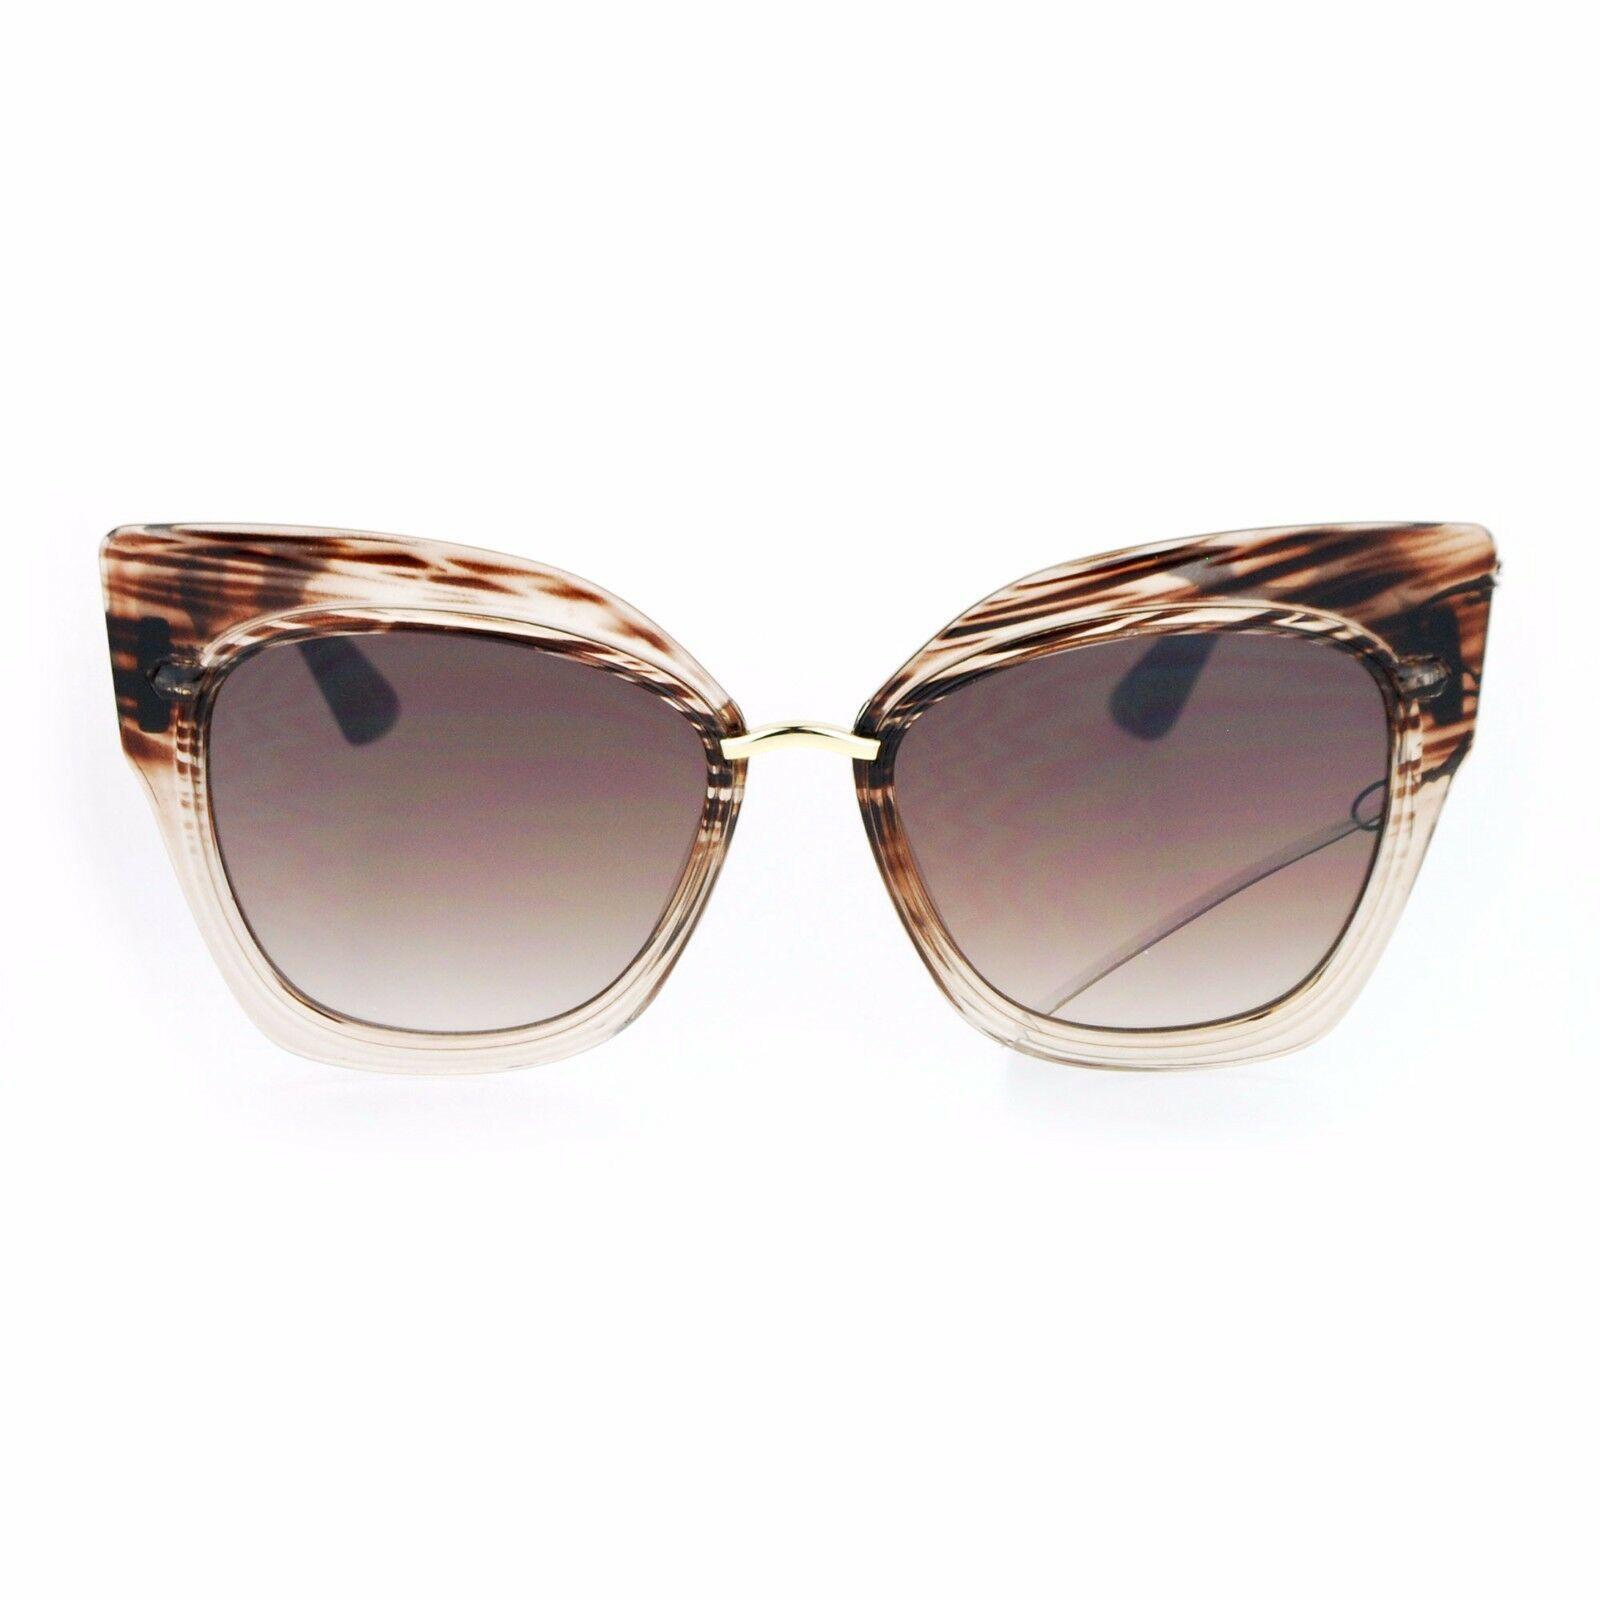 Oversized Fashion Sunglasses Womens Square Cateye Butterfly UV 400 image 14